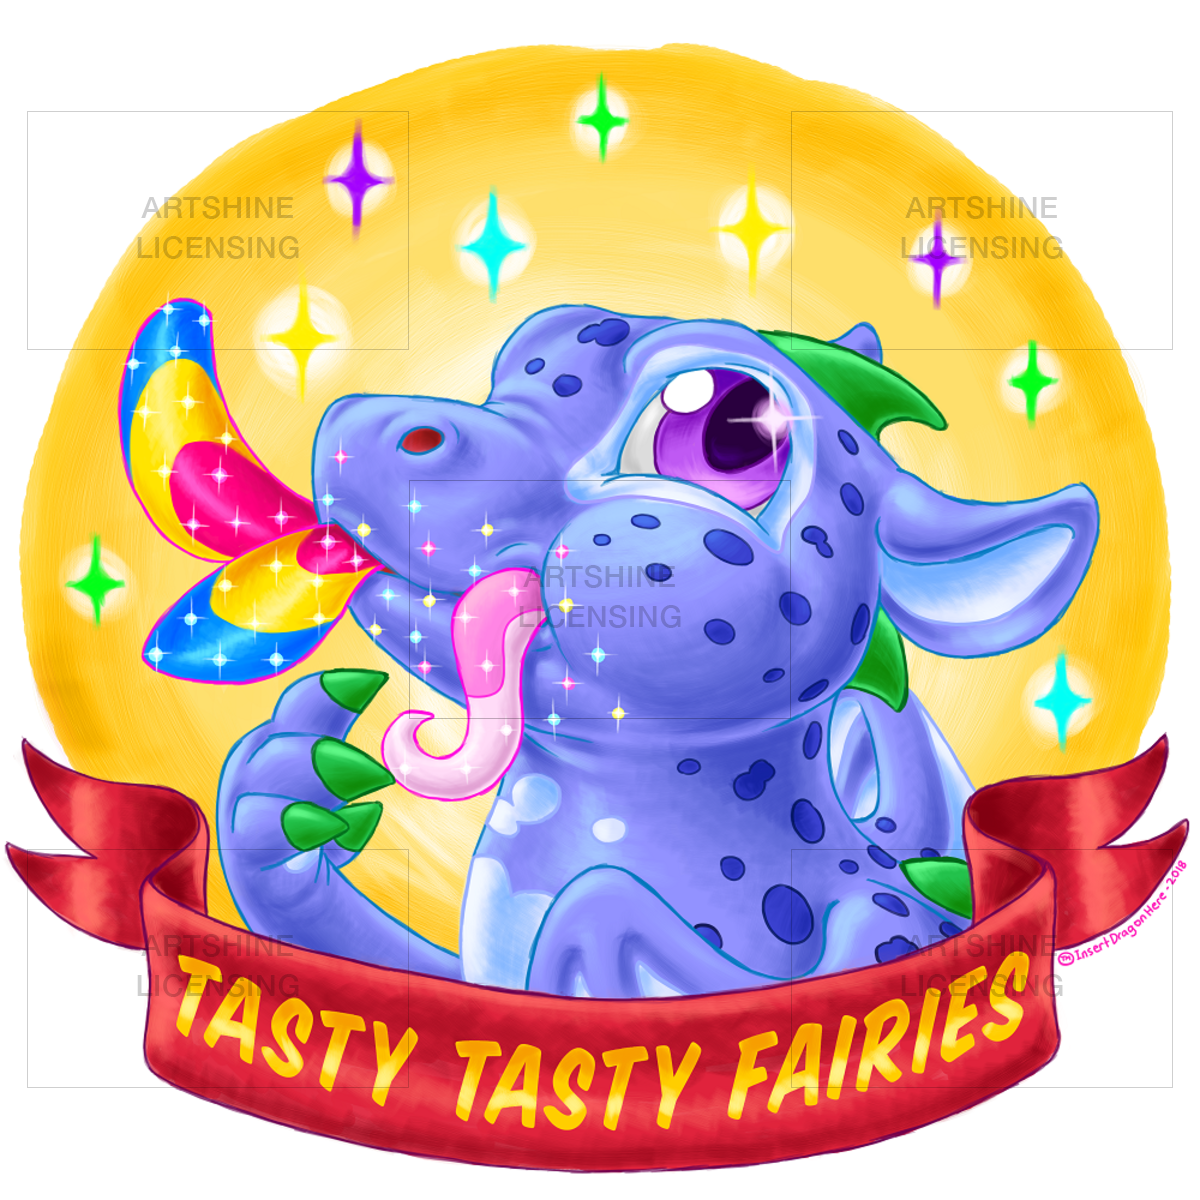 Tasty Tasty Fairies - Dragon version